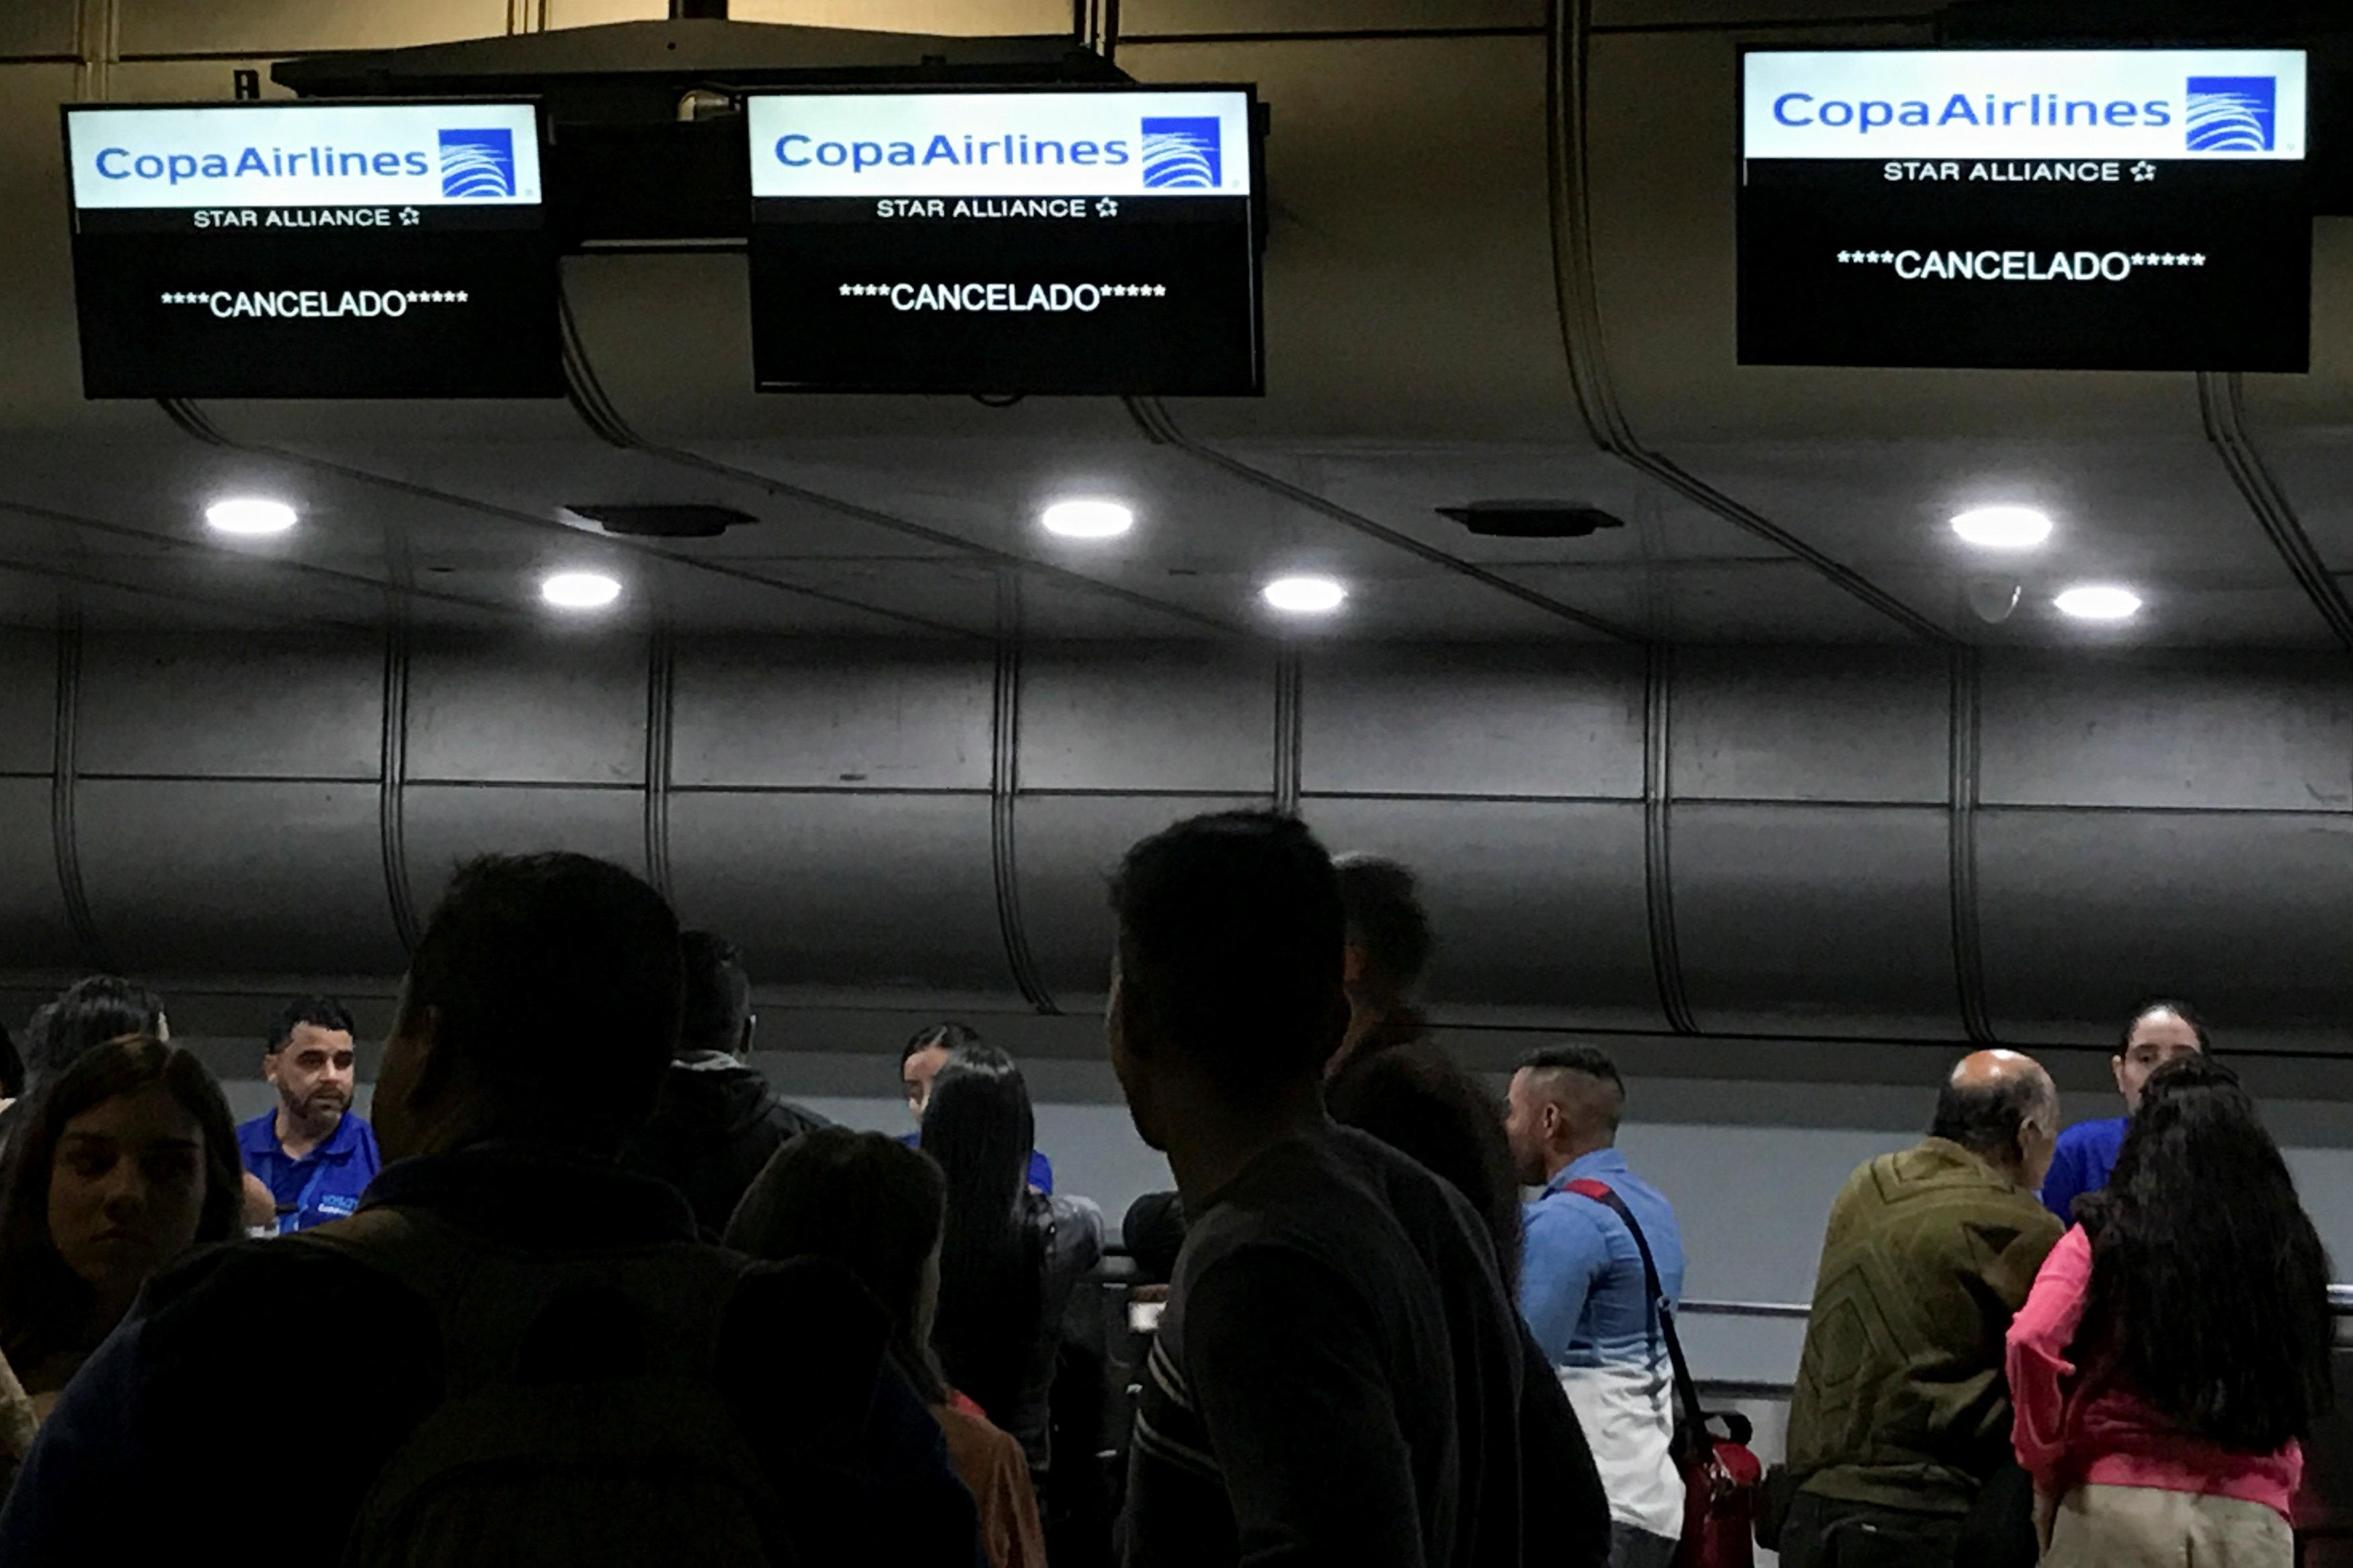 Venezuela hurts its own with Copa airline suspension: Panama's Varela